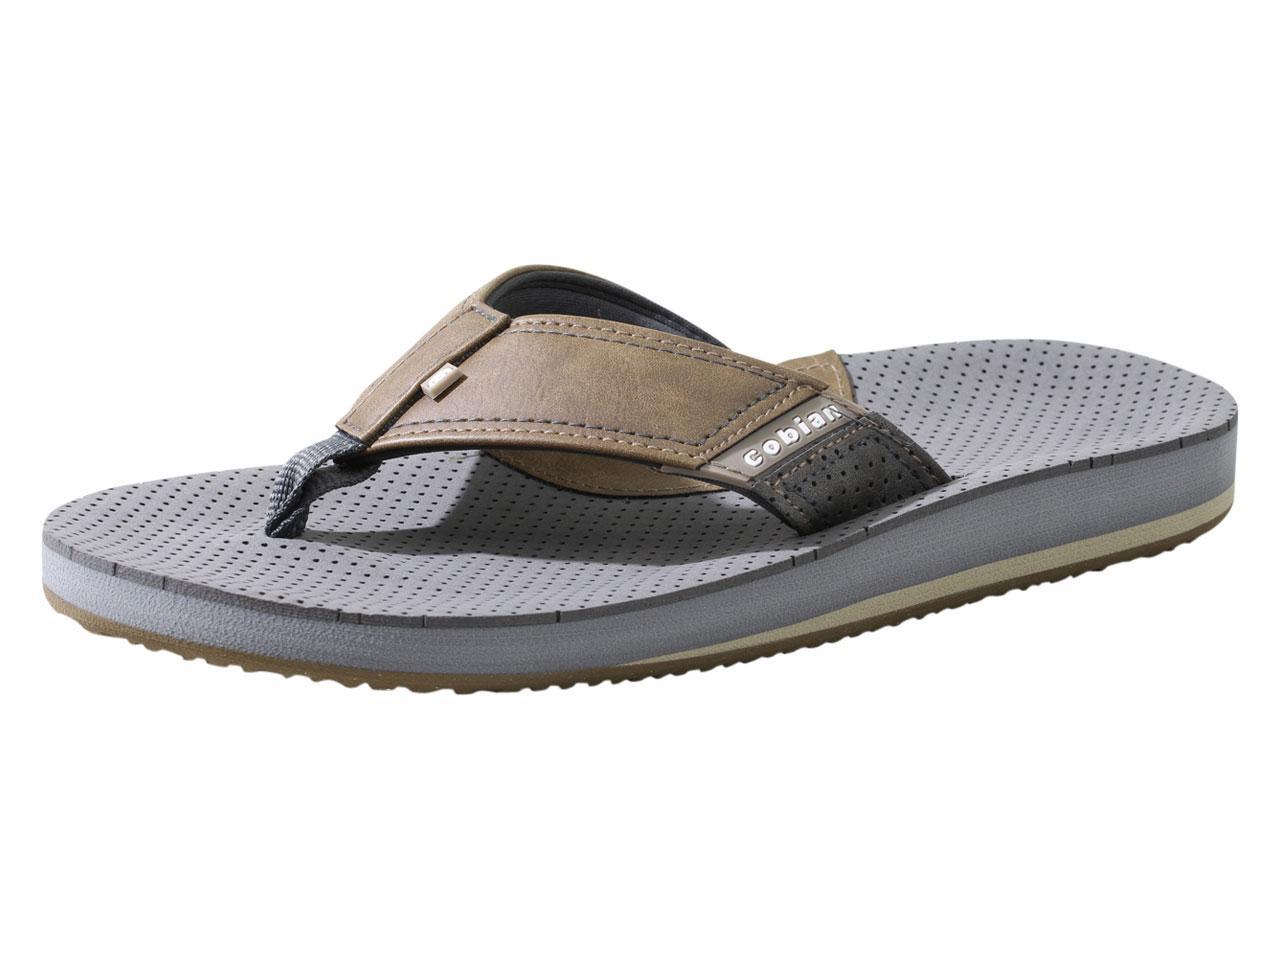 Image of Cobian Men's A.R.V. II Flip Flops Sandals Shoes - Chocolate - 9 D(M) US